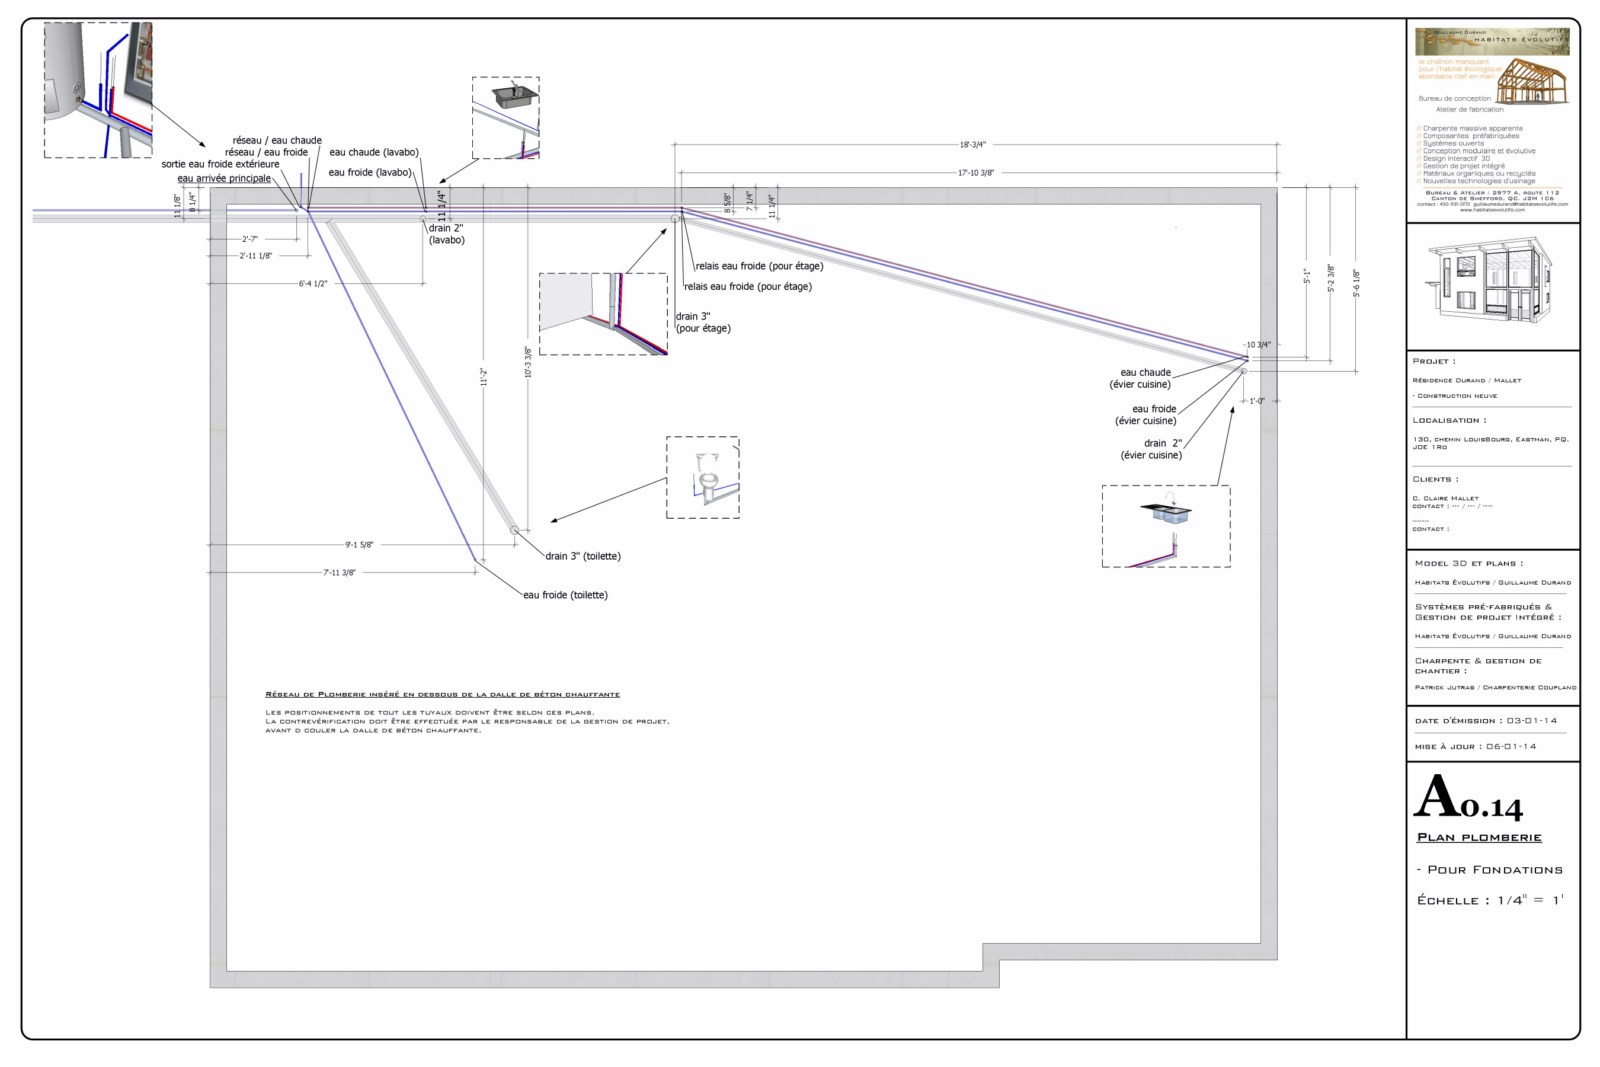 Projet type laytout 02-02-14_14 [1600x1200]